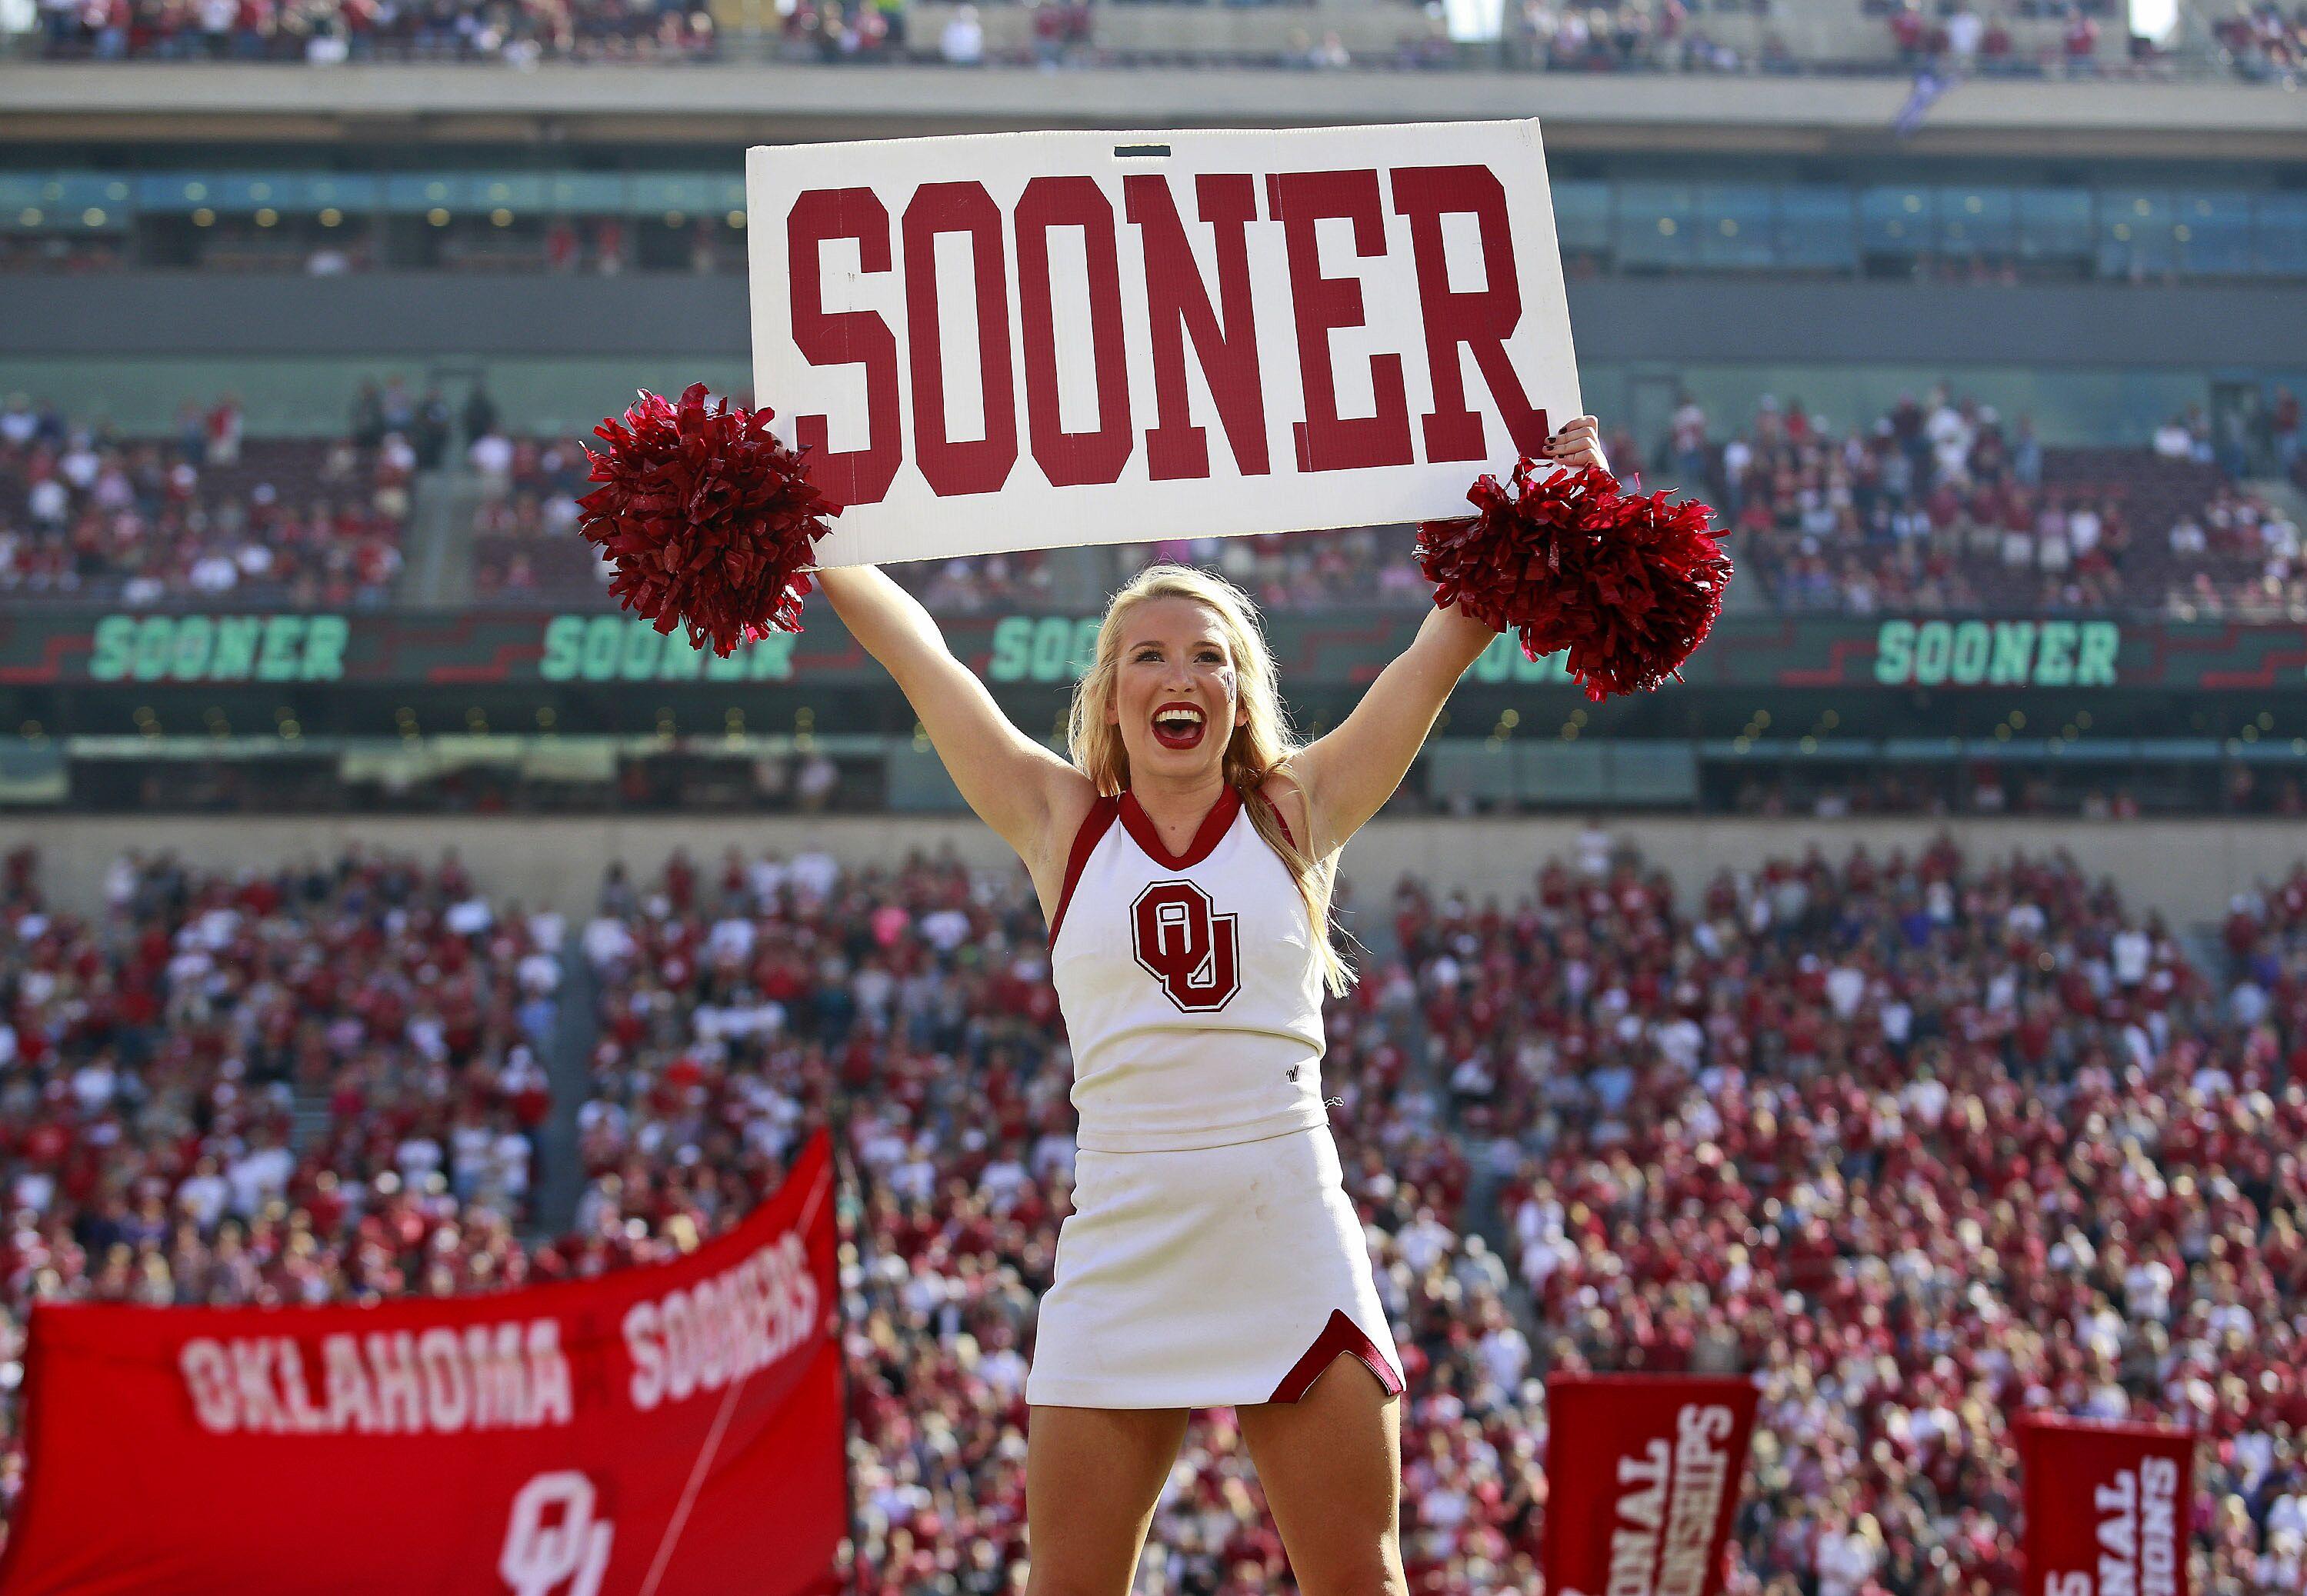 Oklahoma football: Ranking the Sooner teams of the past ...